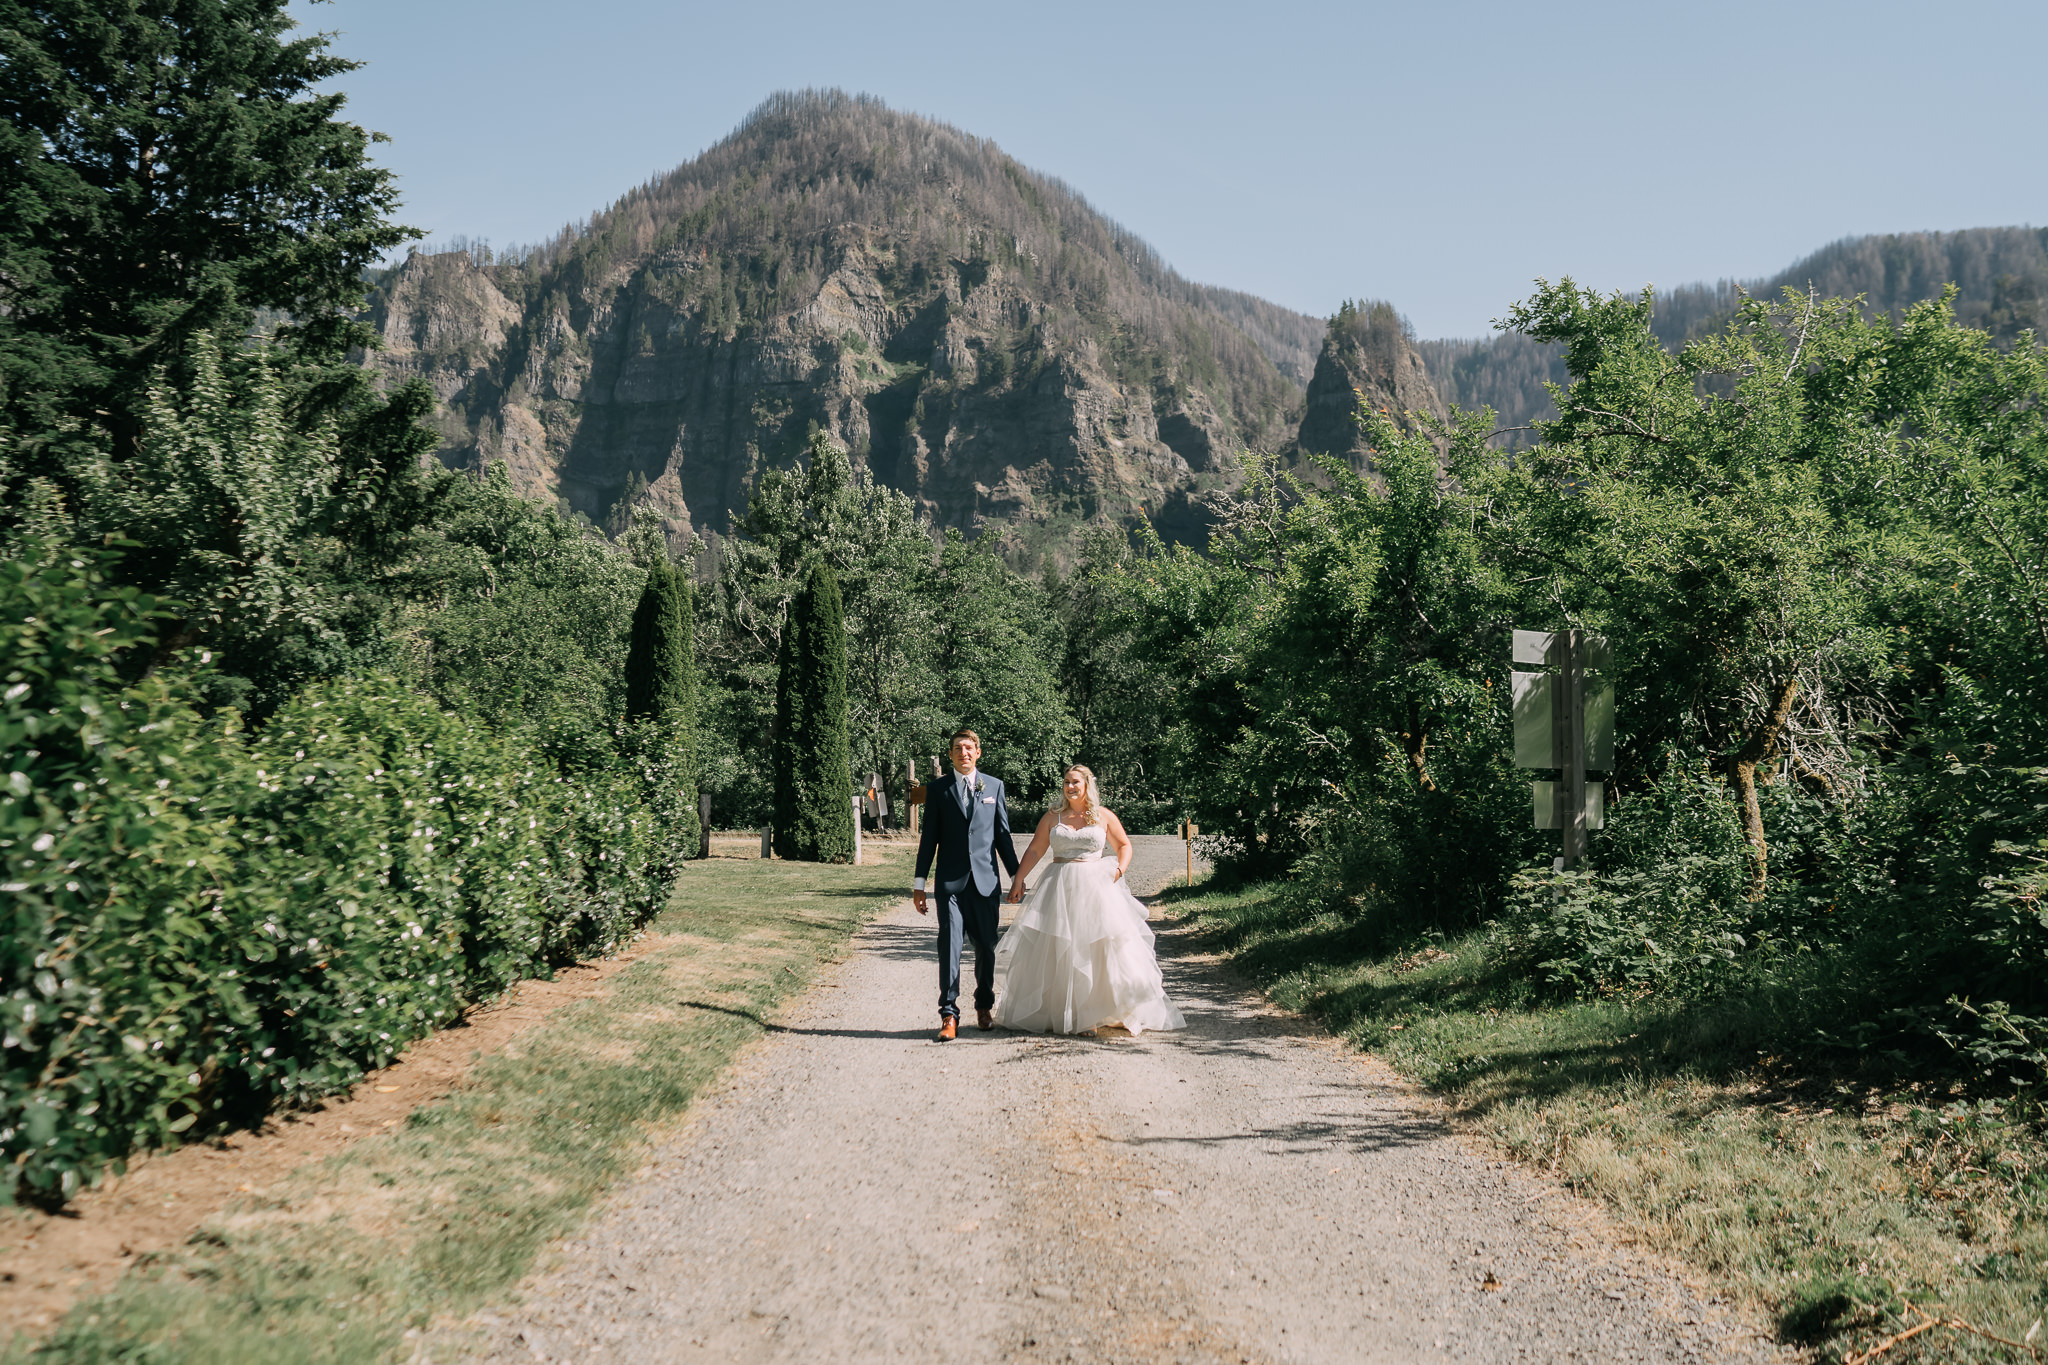 Wedding First Look Hug Kiss Columbia River Gorge Cascade Locks Cliffside